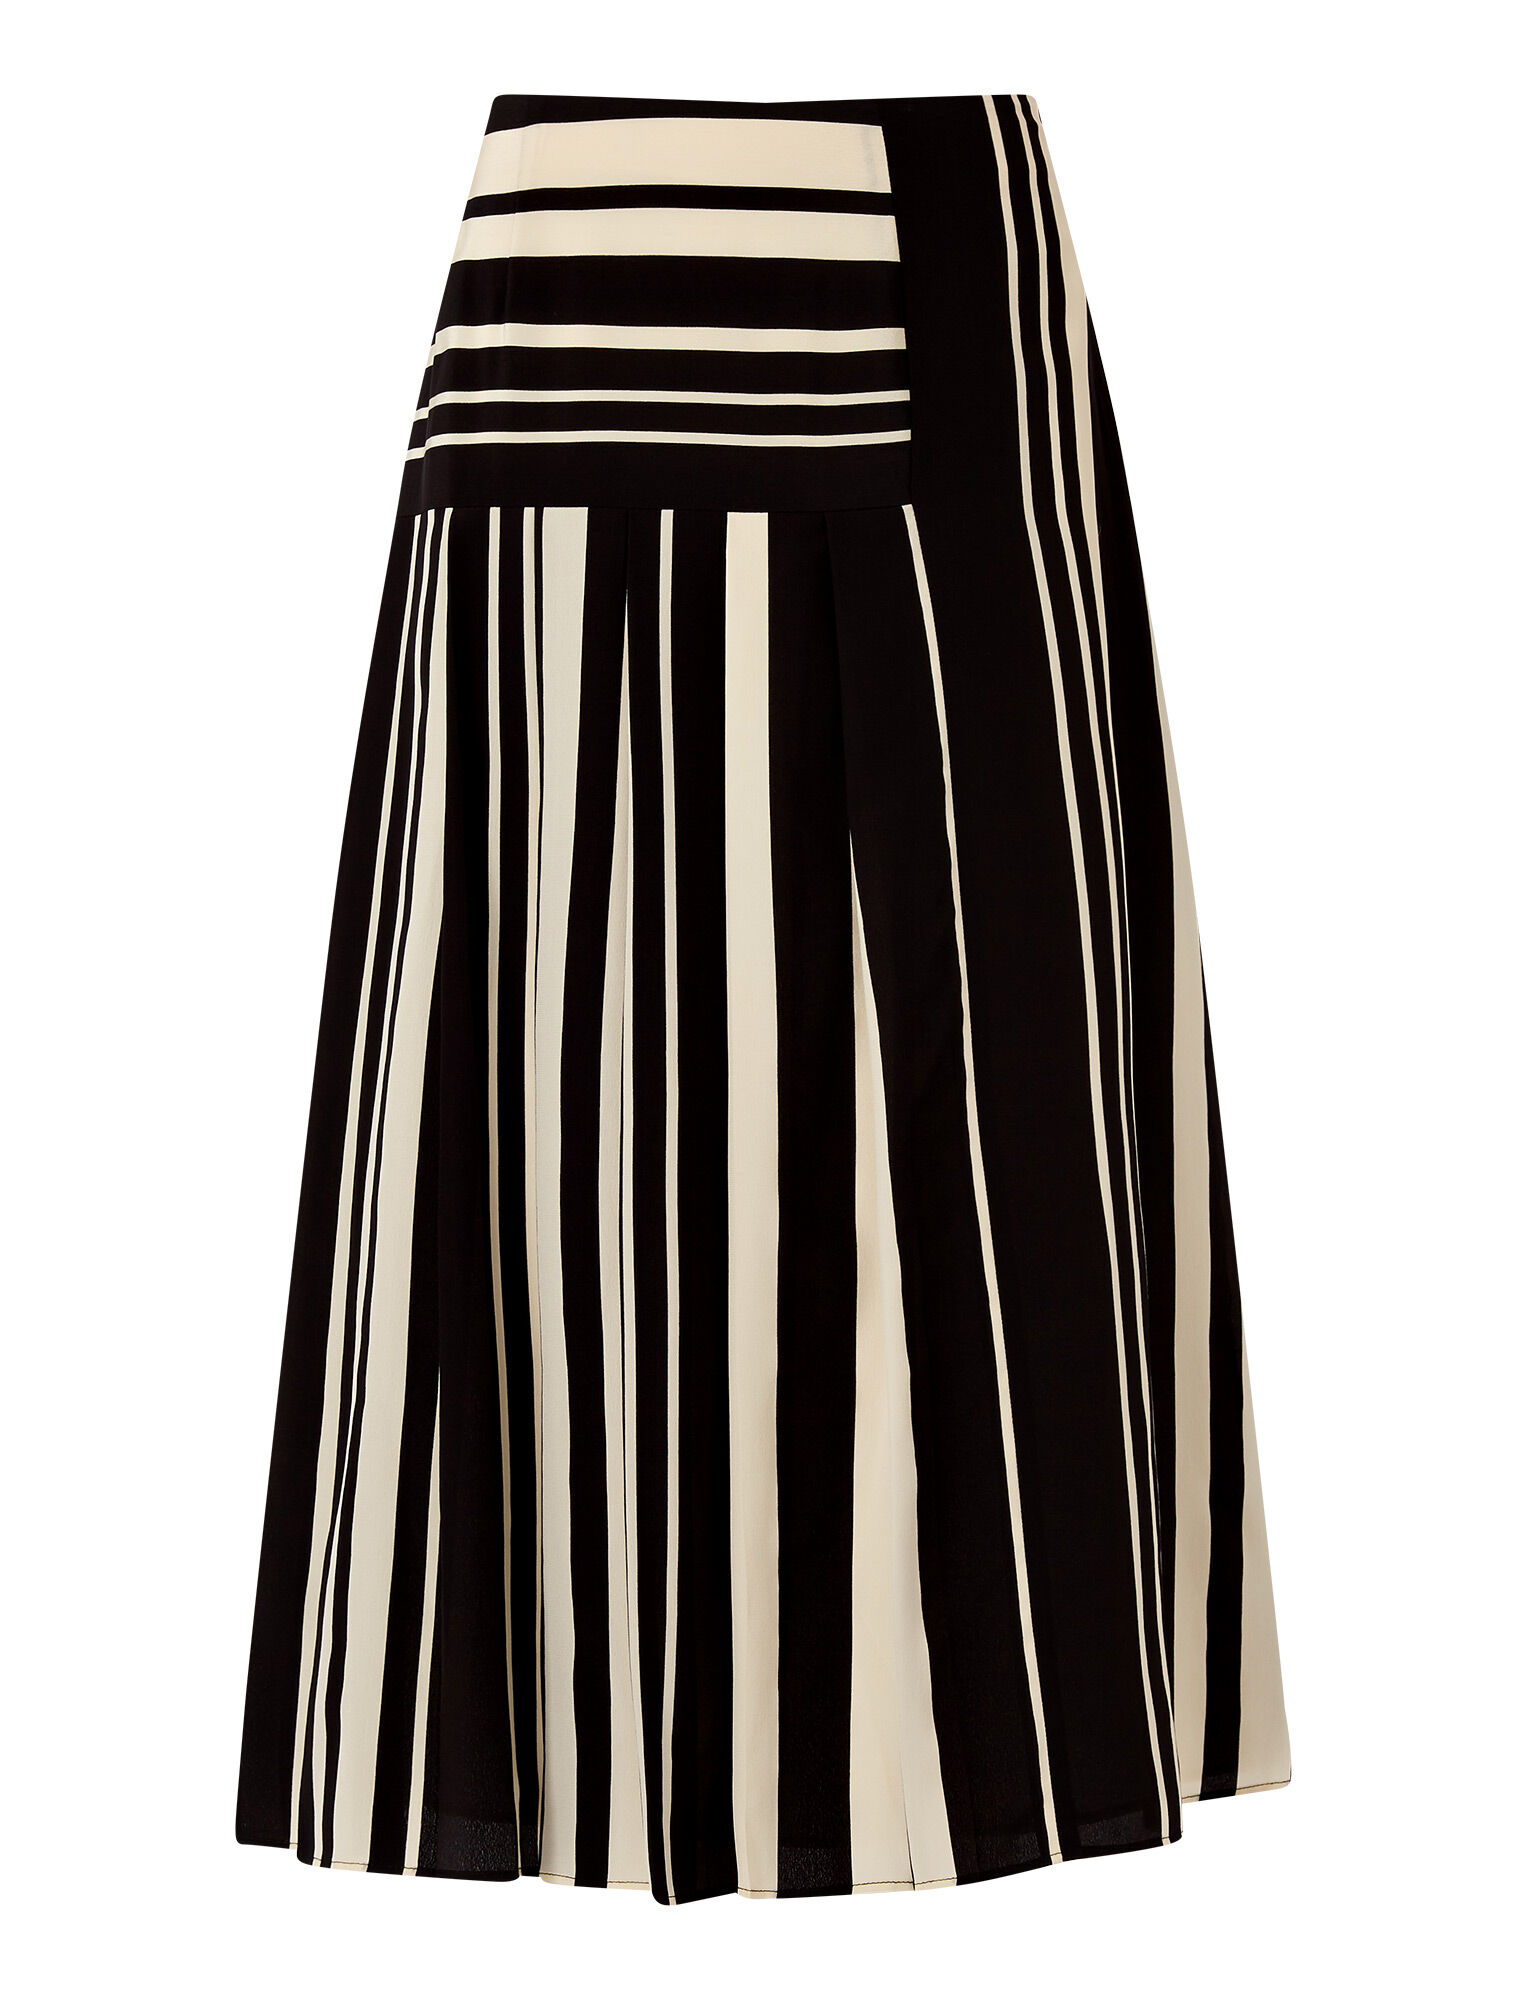 Joseph, Silk Stripes Swanson Skirt, in GREY/BLACK